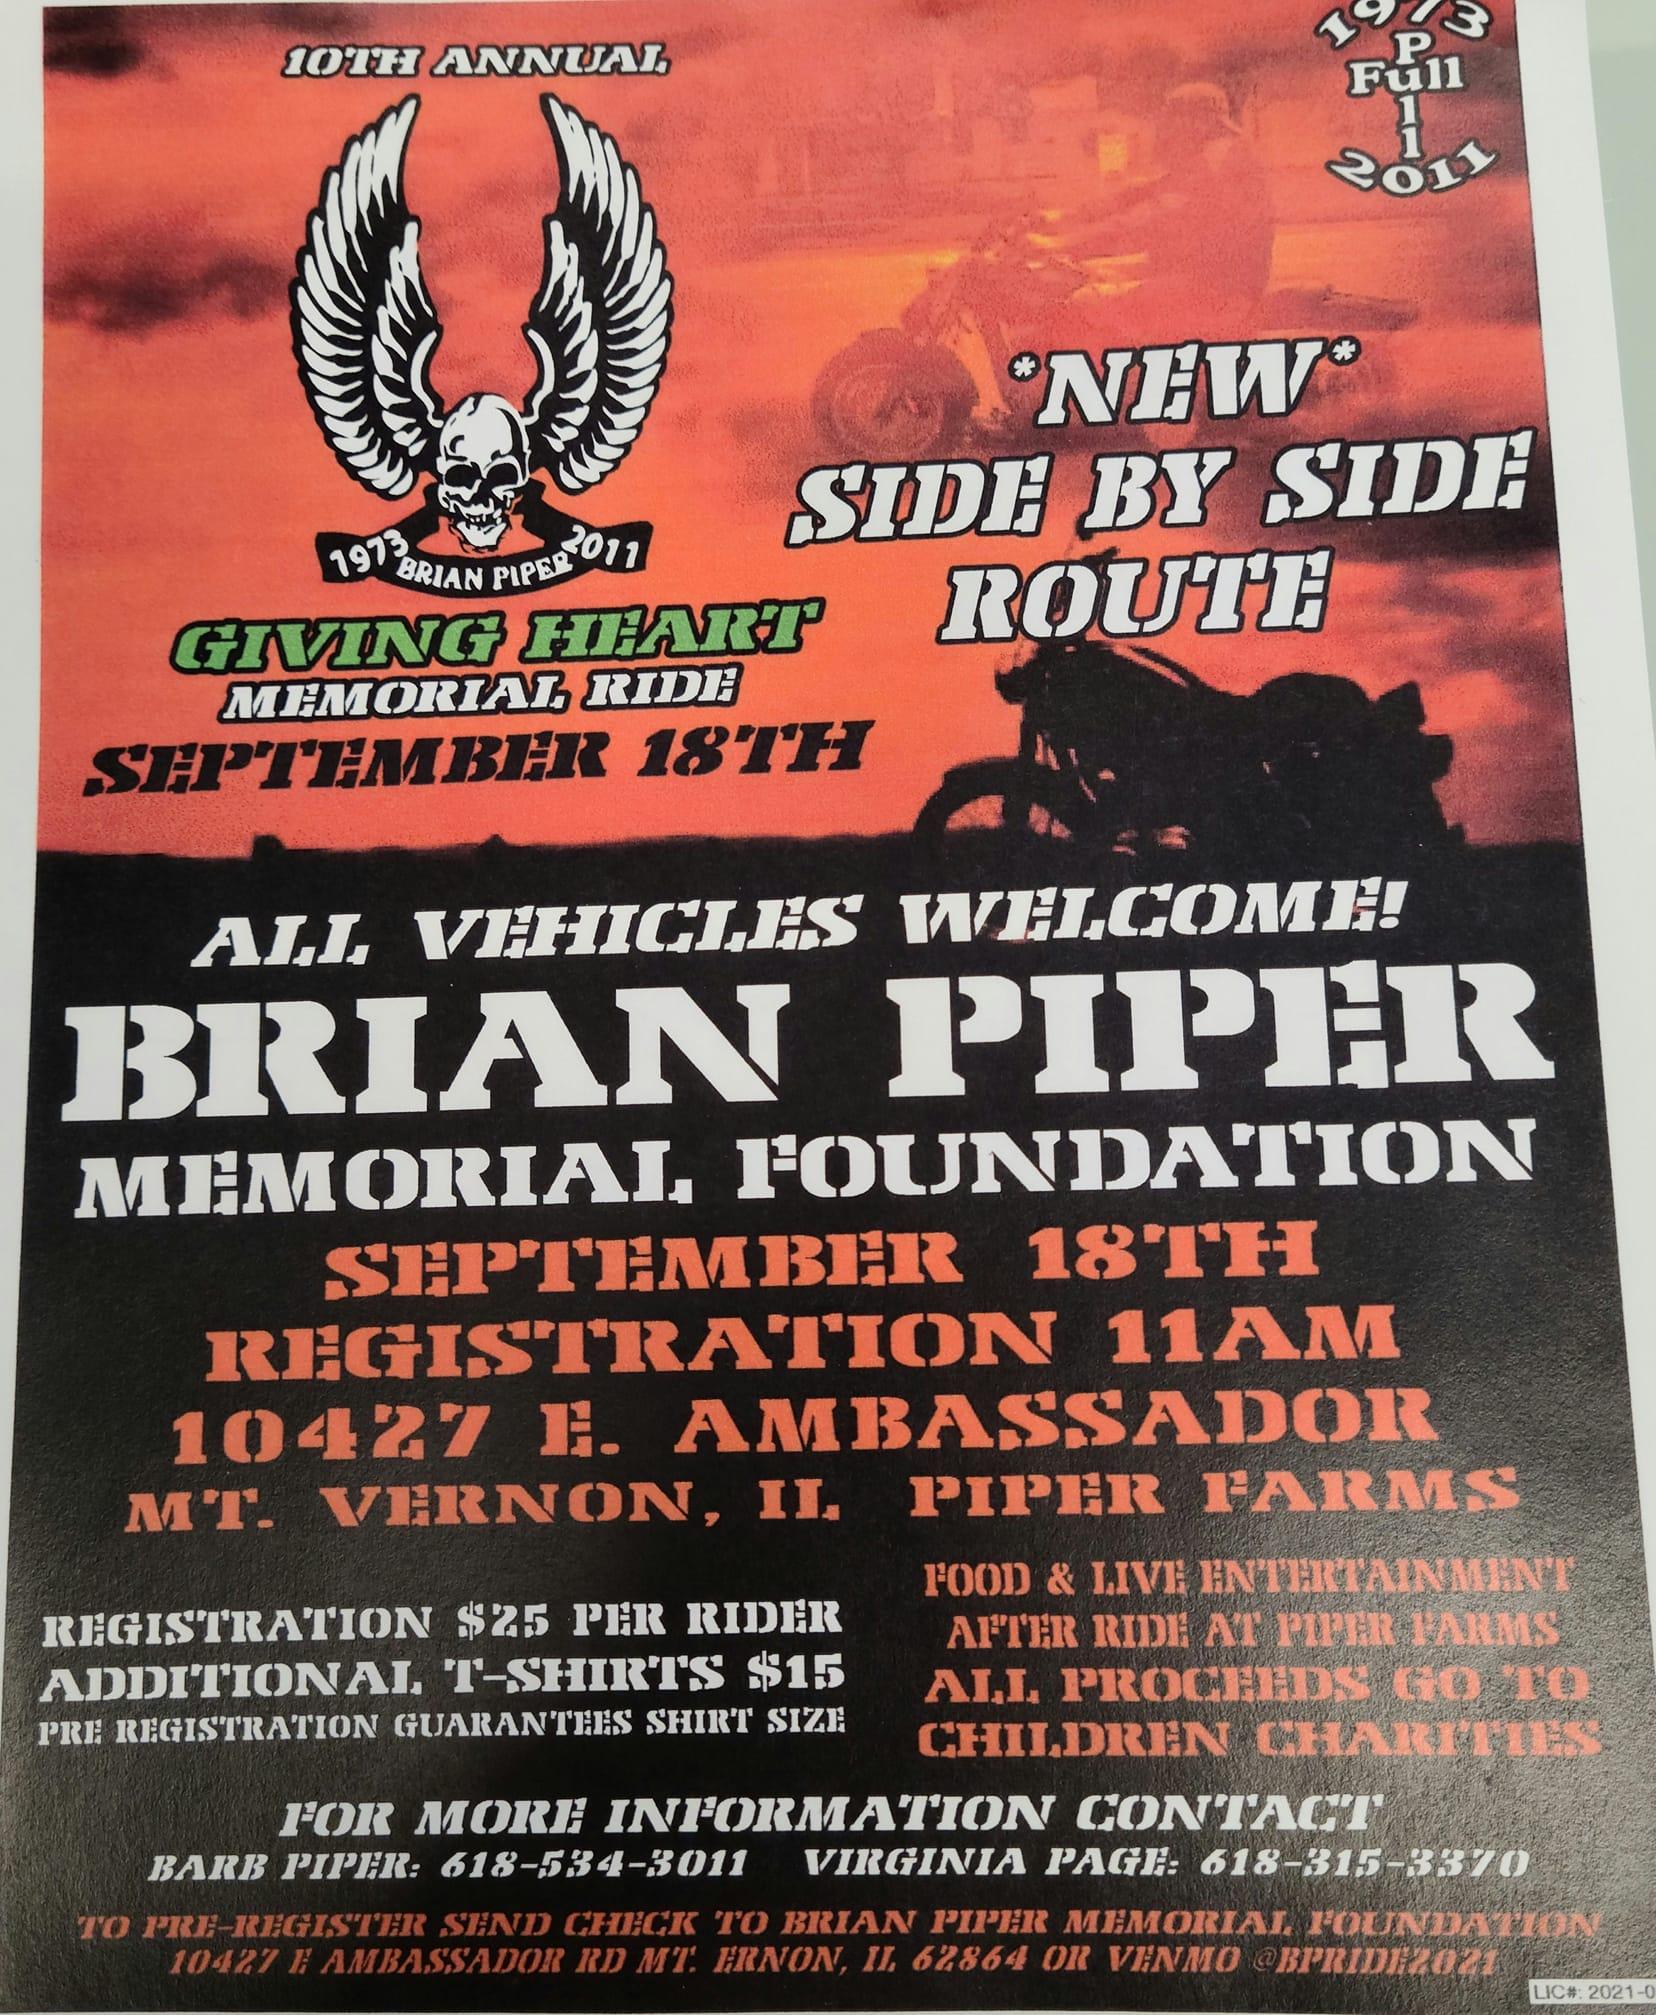 Brian Piper Memorial Ride Sept 18th